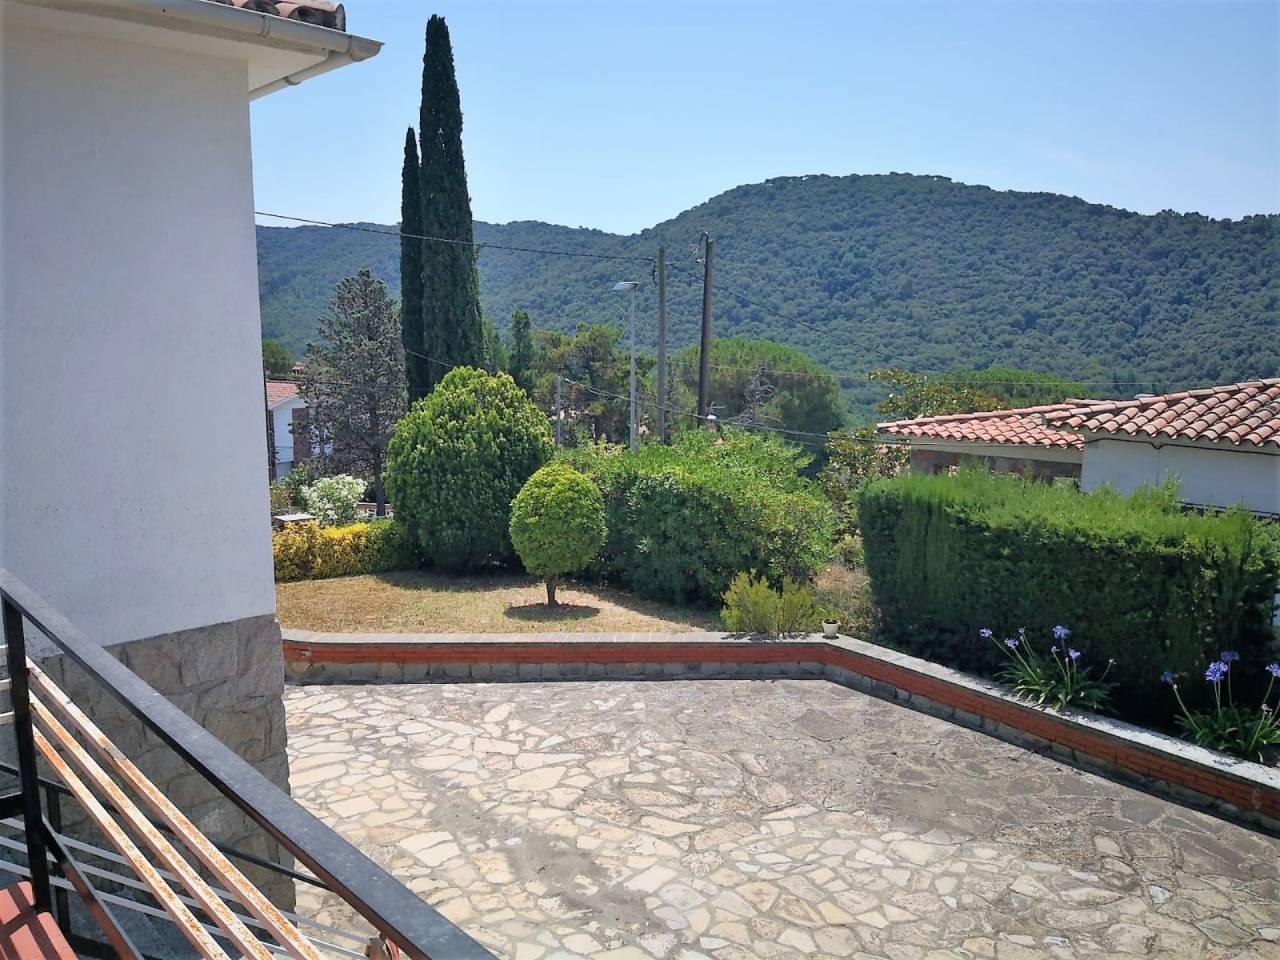 Casa  Vilanova del vallès. Hab. individuales: 1, casa habitaciones dobles: 2, 2 baños, anti